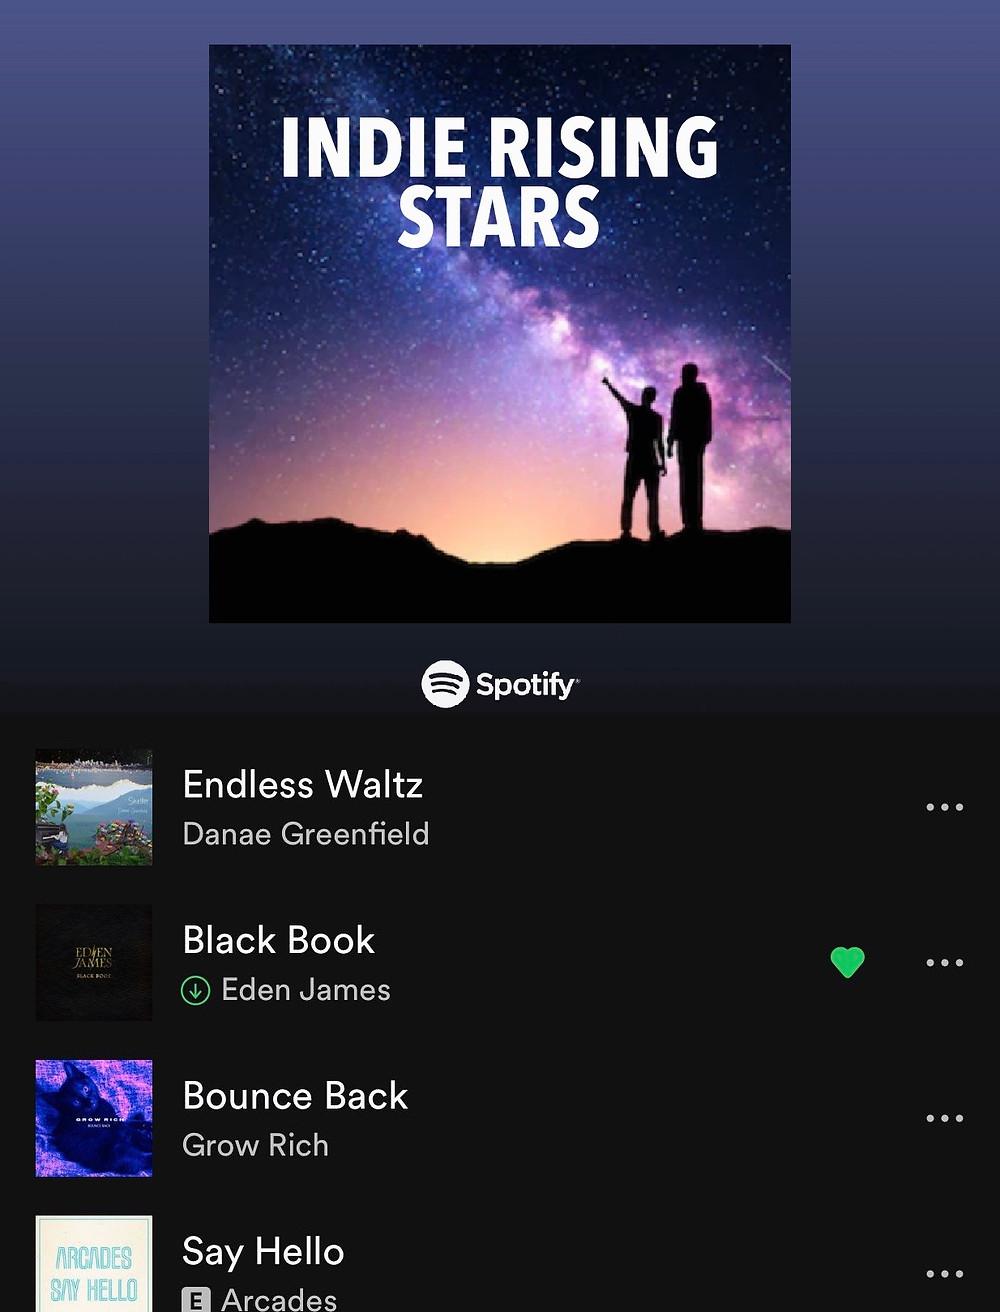 Indie Rising Stars Spotify Playlist